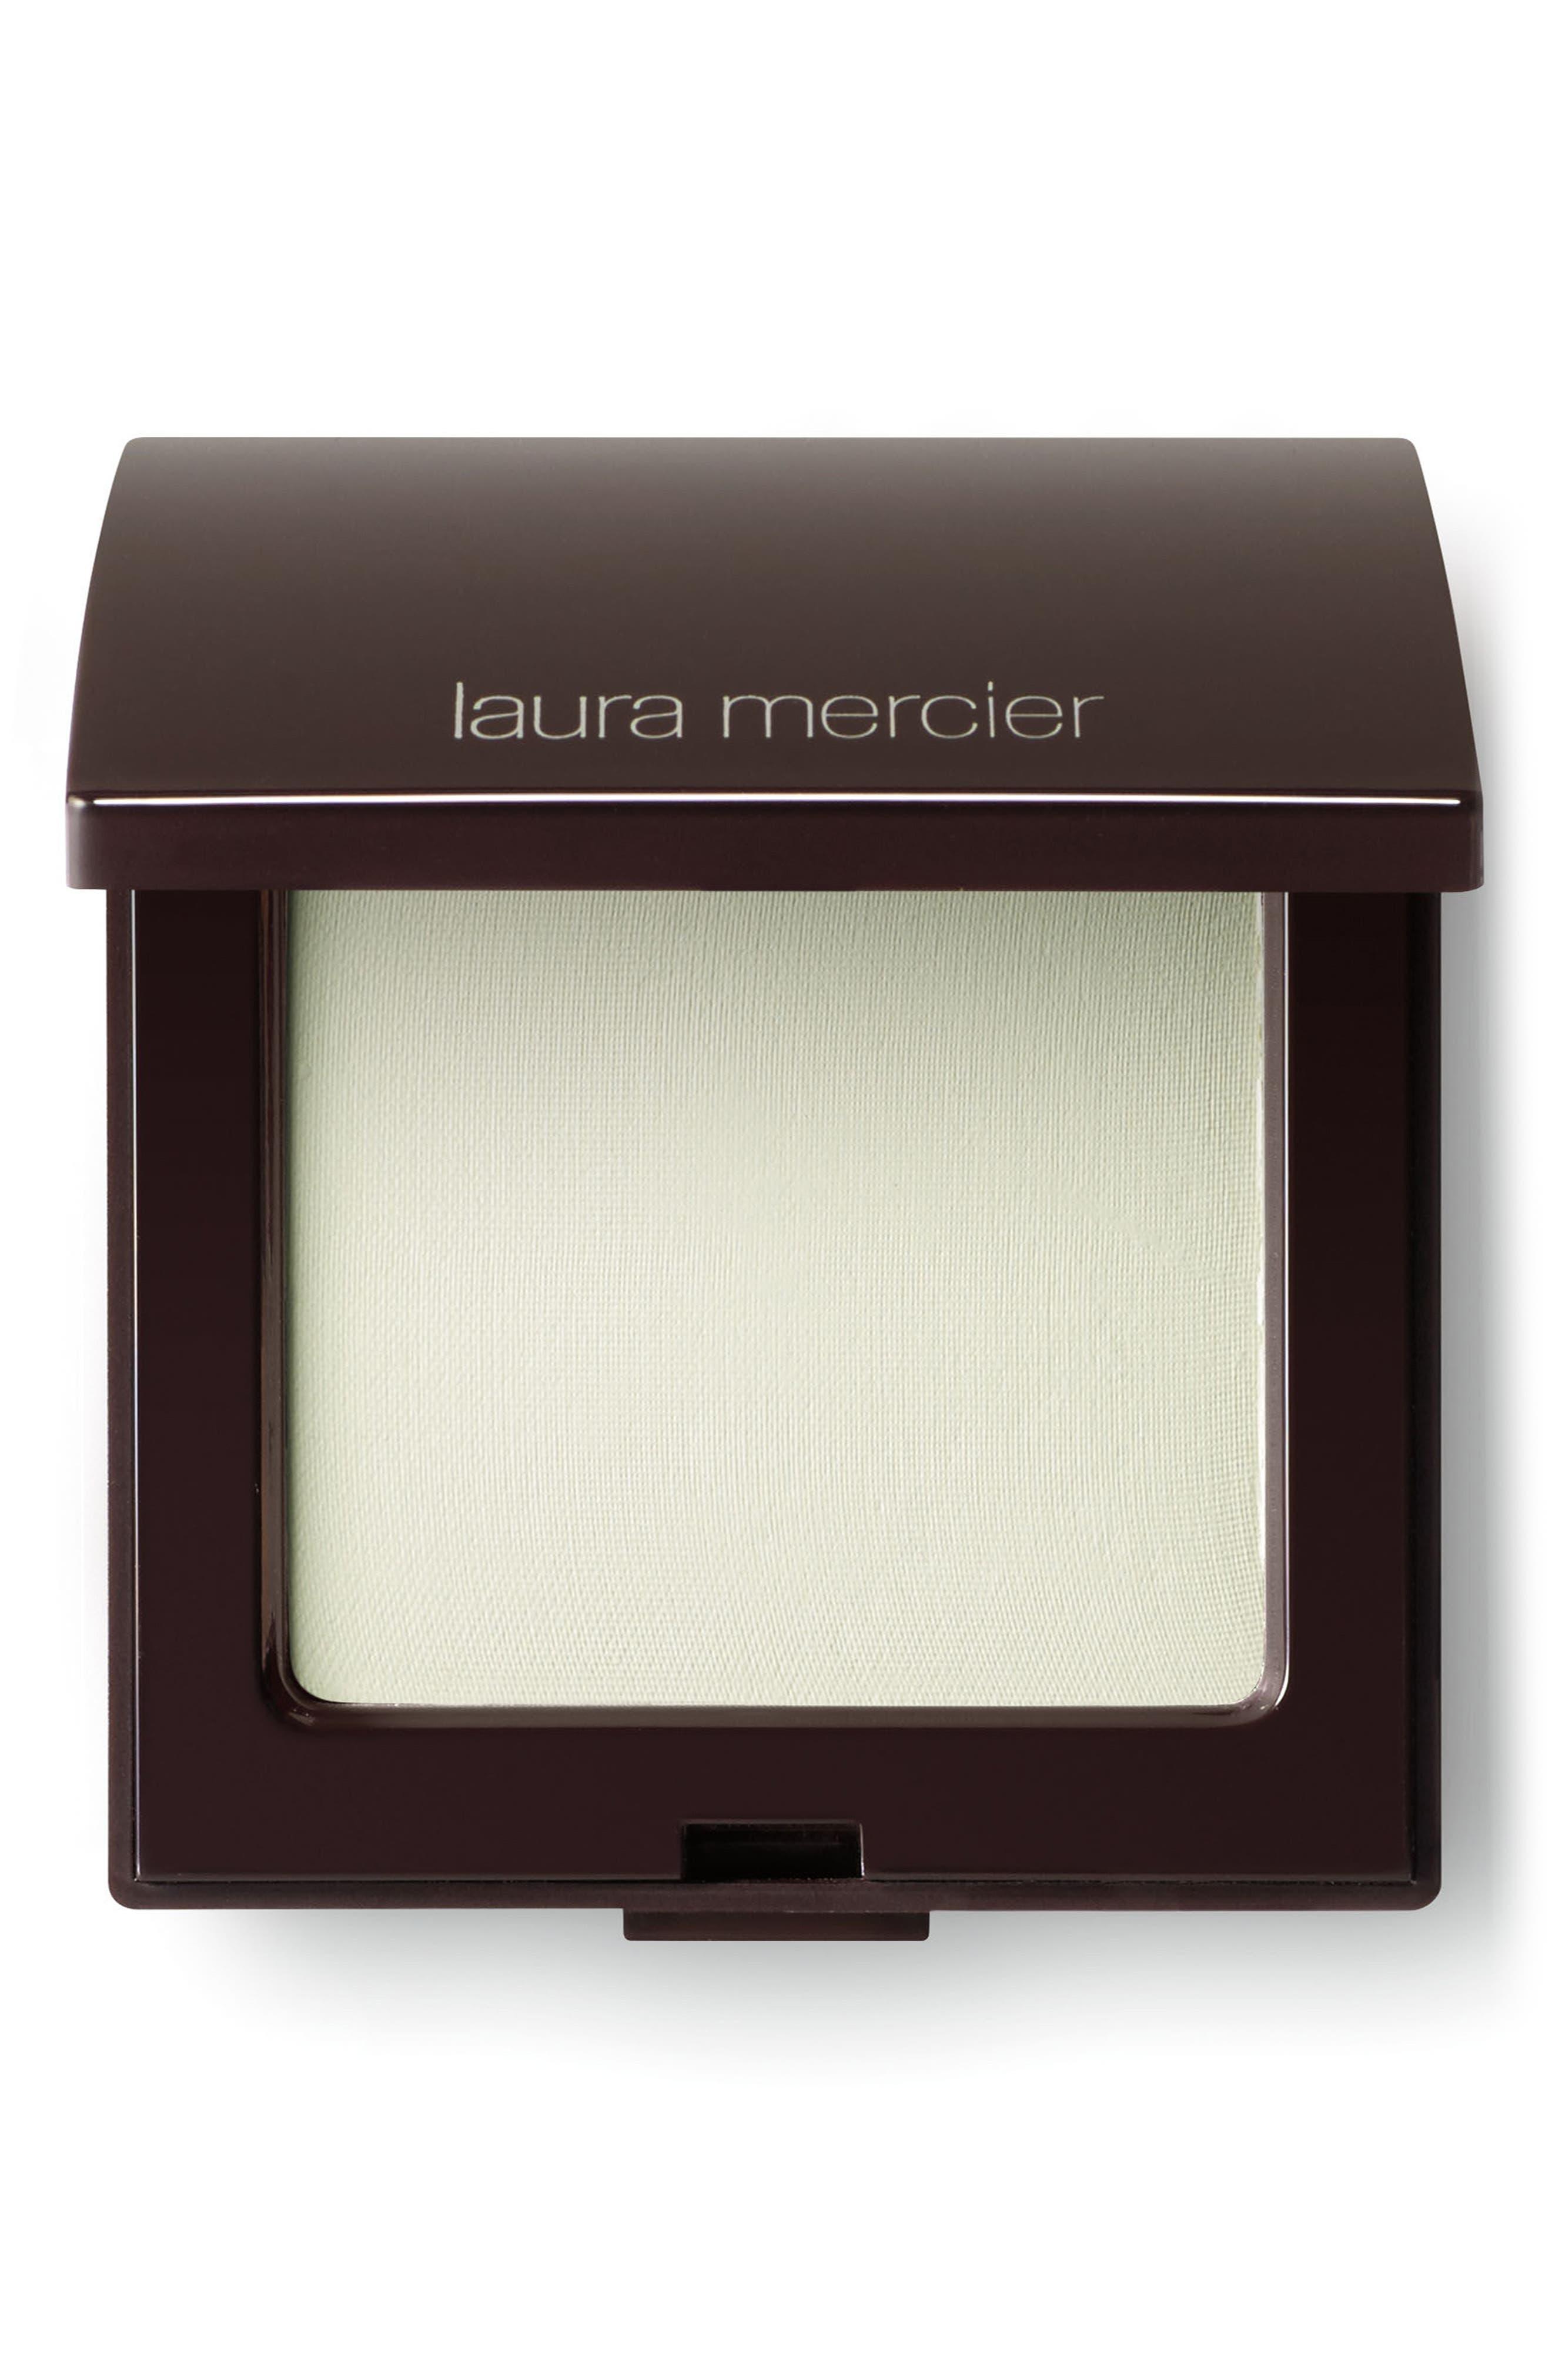 Laura Mercier 'Smooth Focus' Pressed Setting Powder